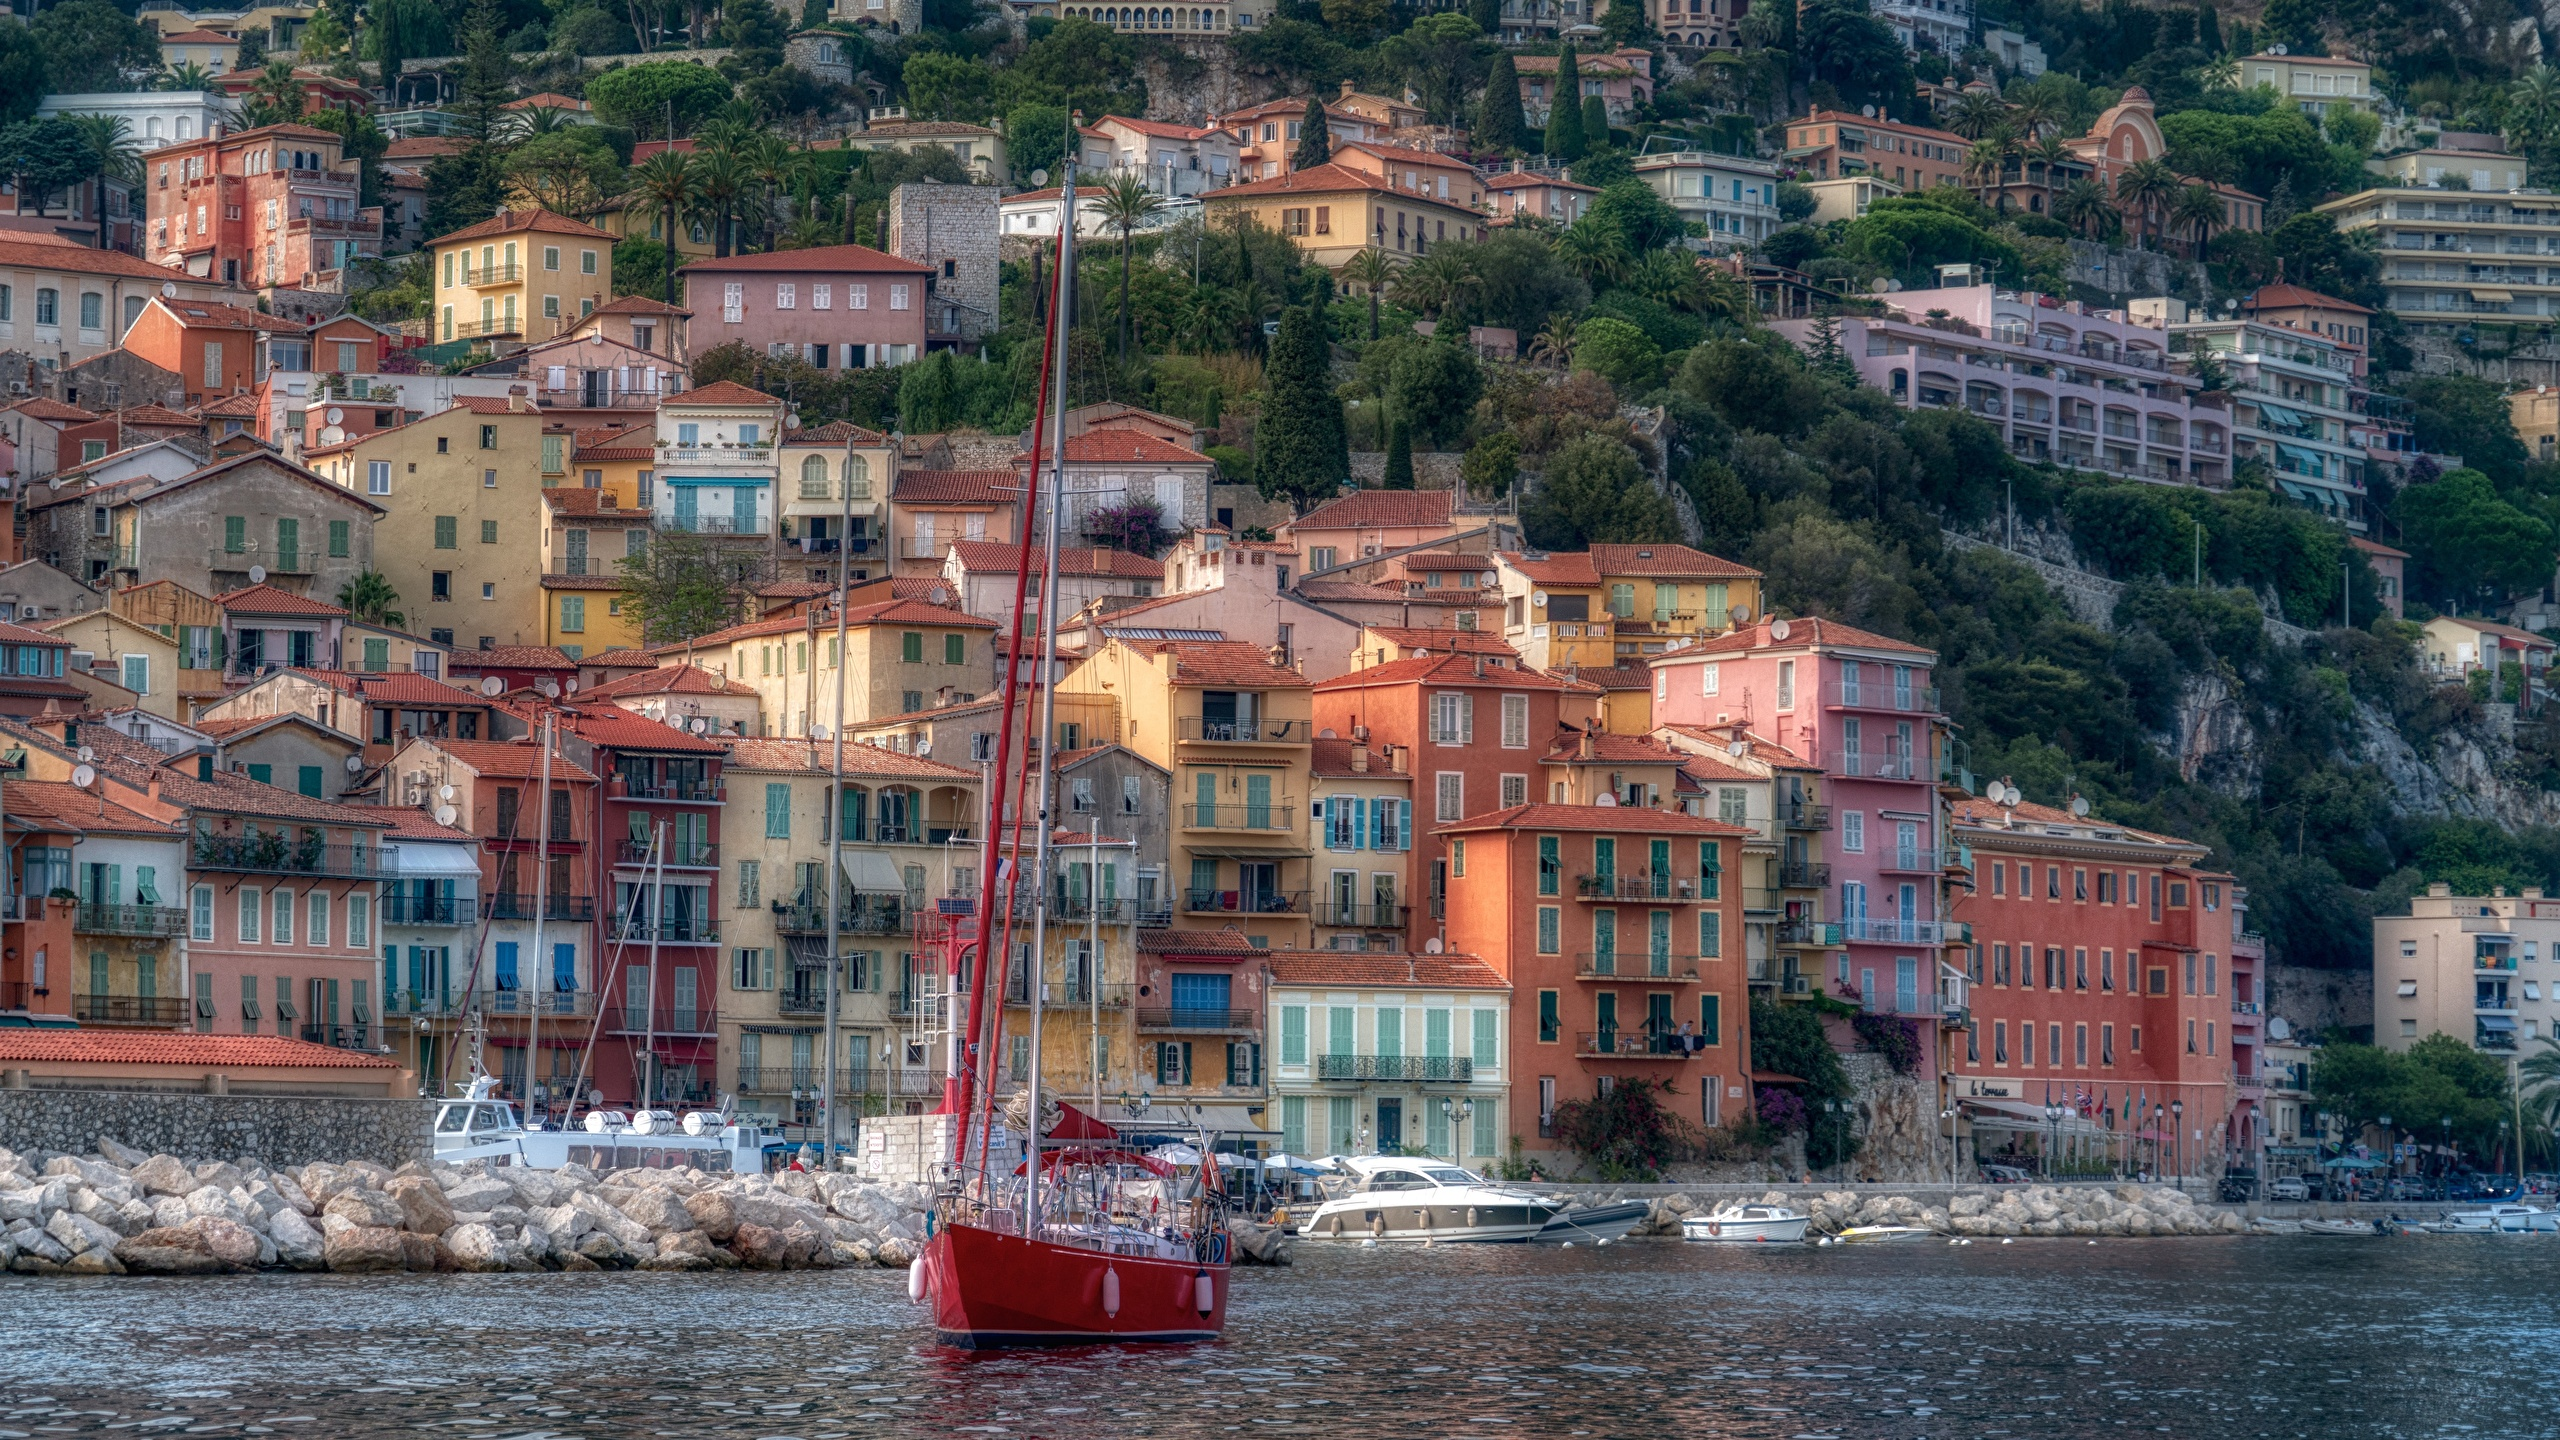 Картинка Франция French Riviera Villefranche-sur-Mer HDRI Яхта Побережье Дома город 2560x1440 HDR берег Города Здания